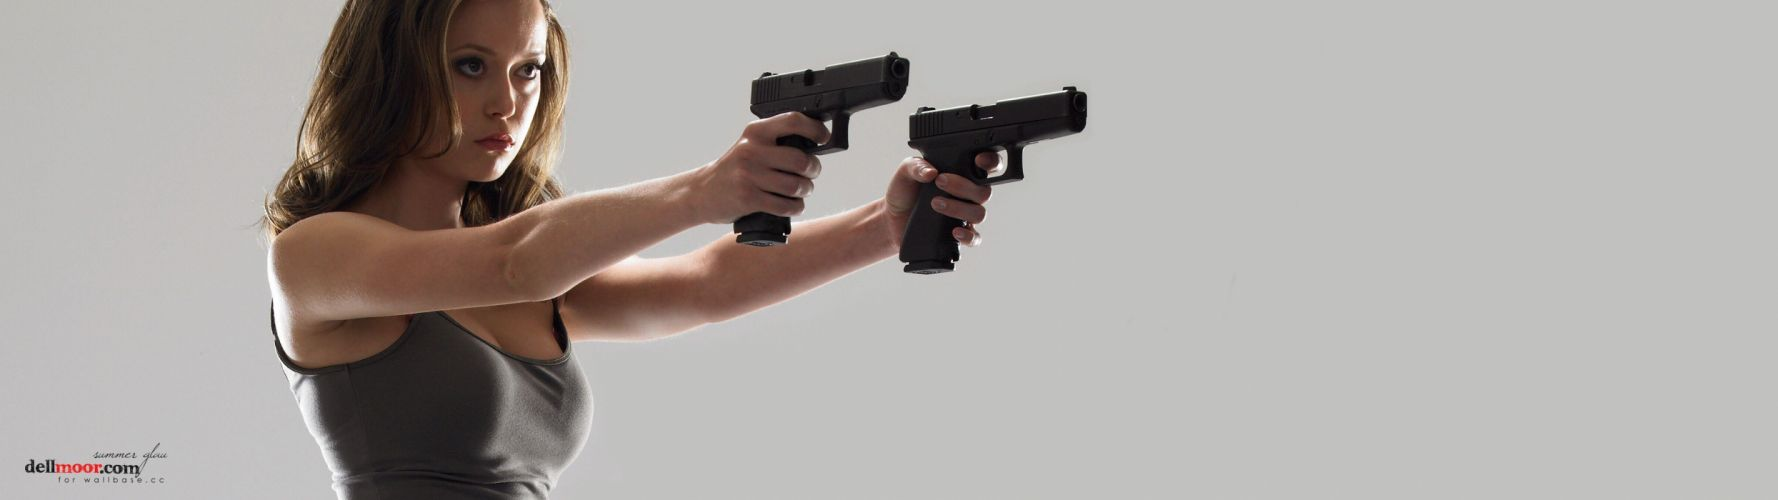 women pistols guns Summer Glau glock Terminator The Sarah Connor Chronicles multiscreen wallpaper